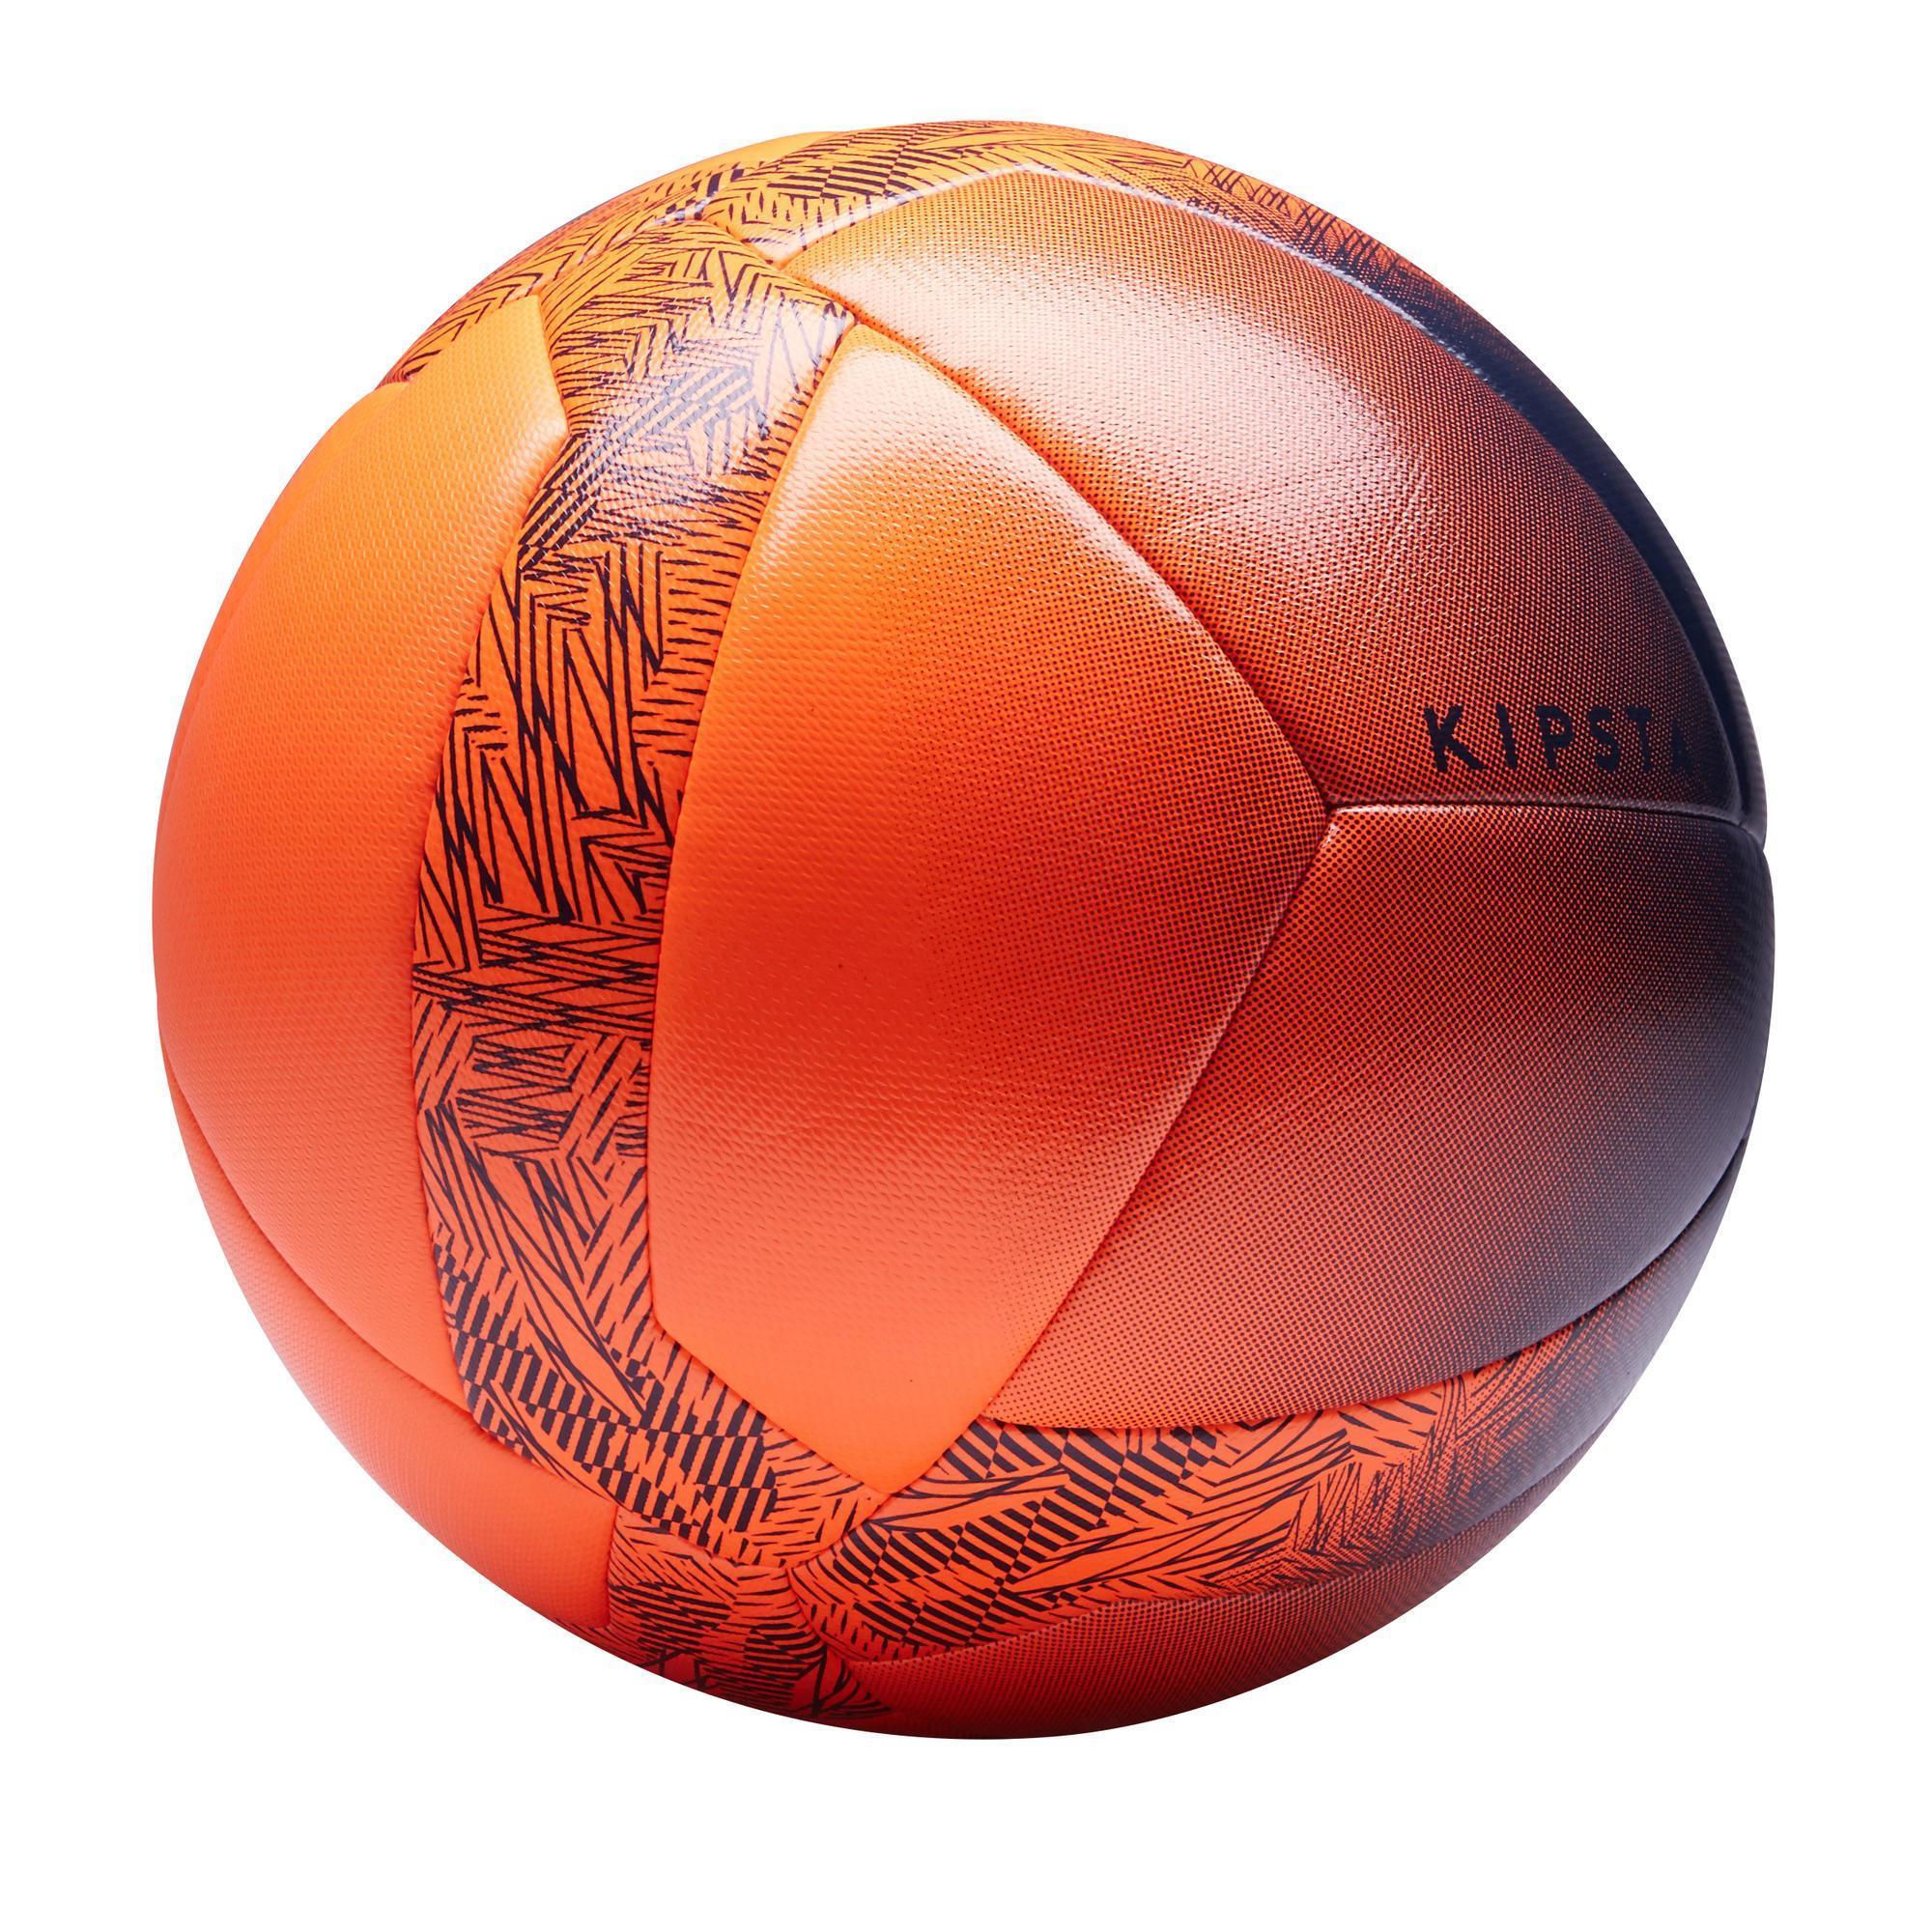 Kipsta Voetbal 5-a-side, Society 100 hybride maat 4 oranje kopen